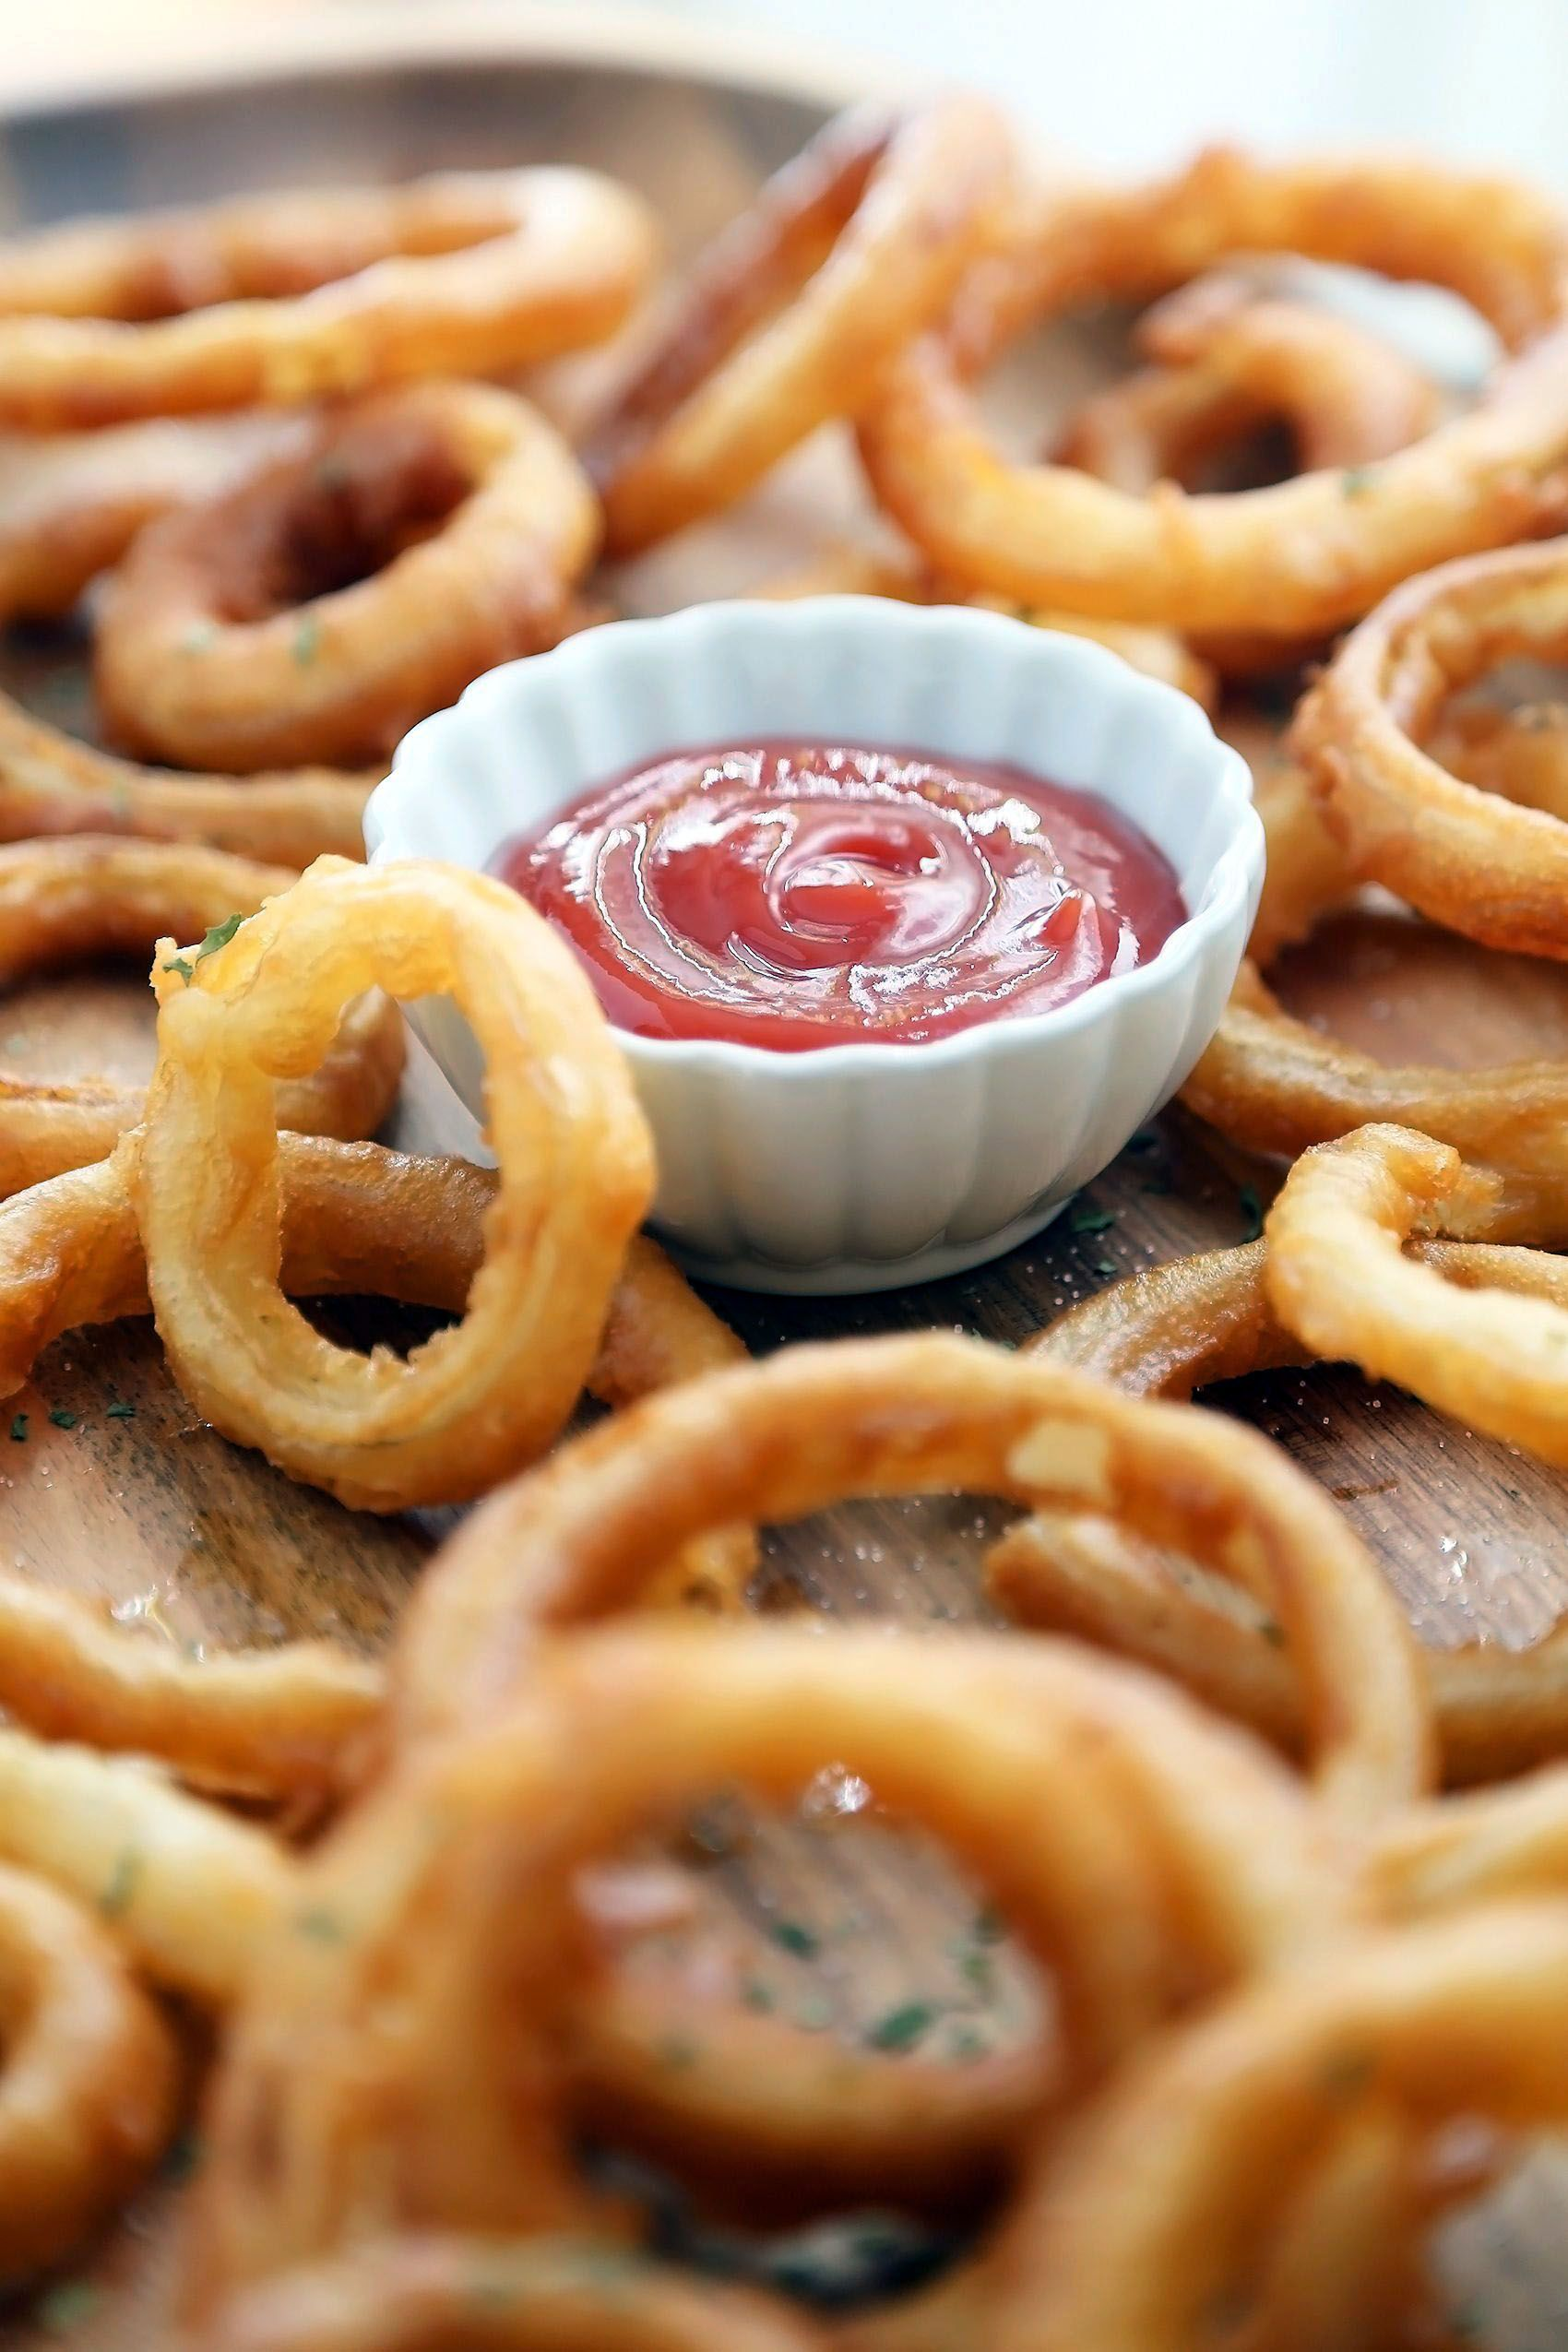 Enjoyable Fried Onion Rings With Buttermilk Just On Jurusolek Com Crispy Onions Onion Rings Food